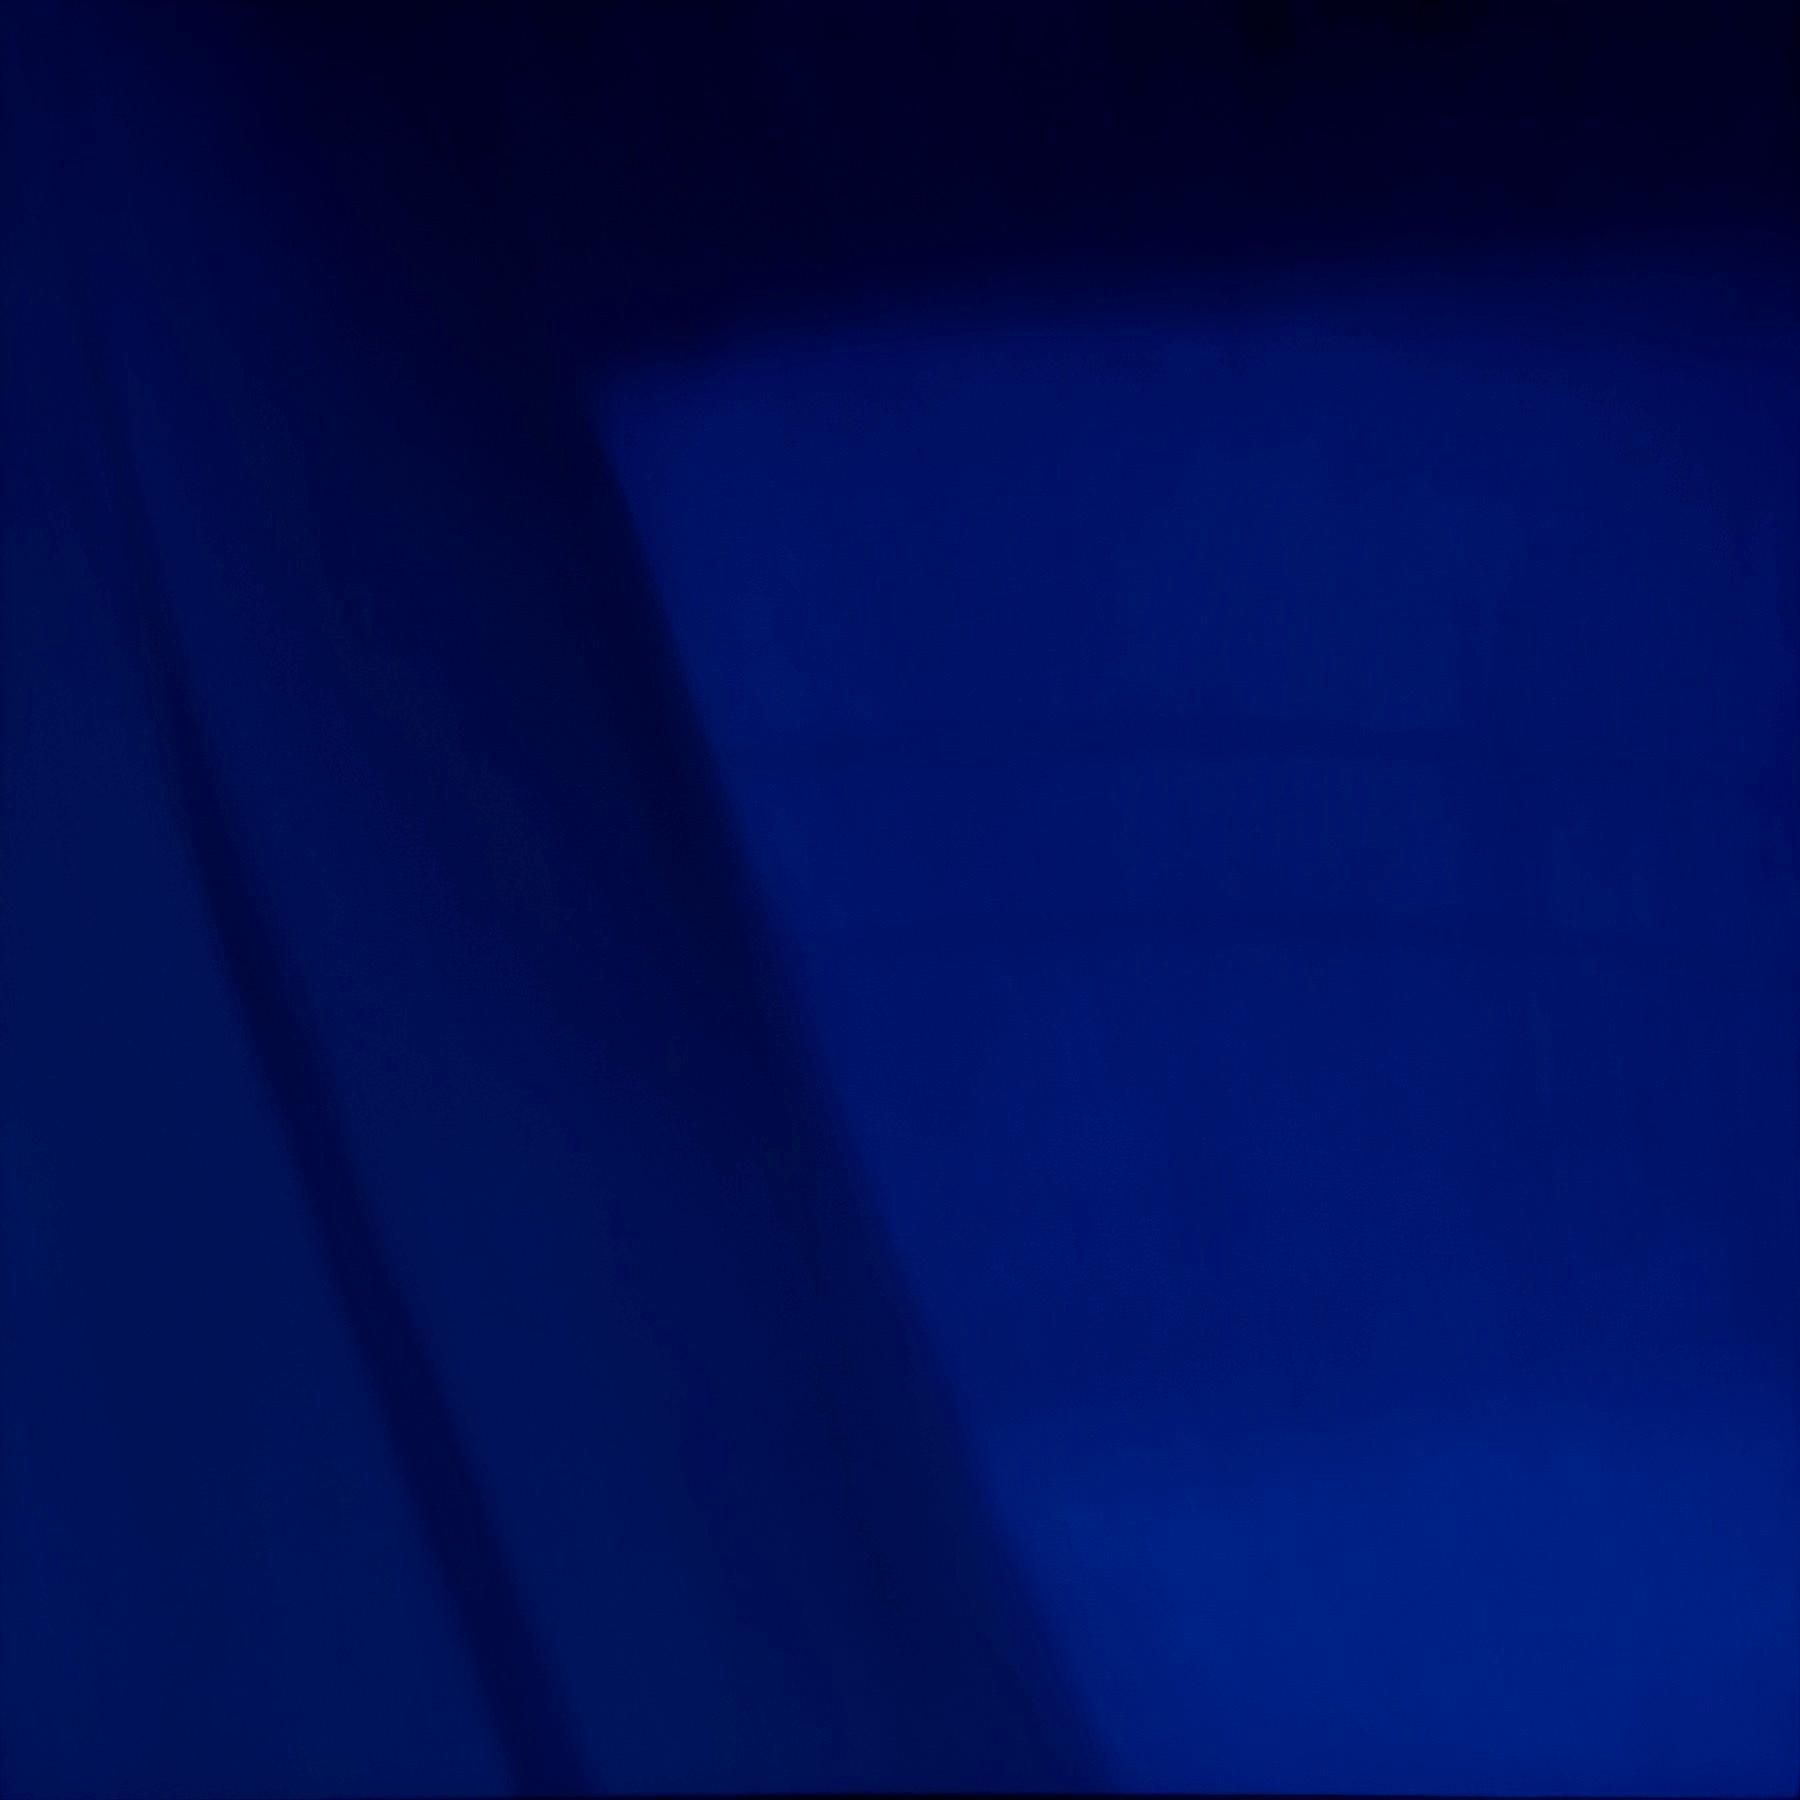 Reflections on Crossing XXXVII / Cobalt Blue, architecture, minimalism